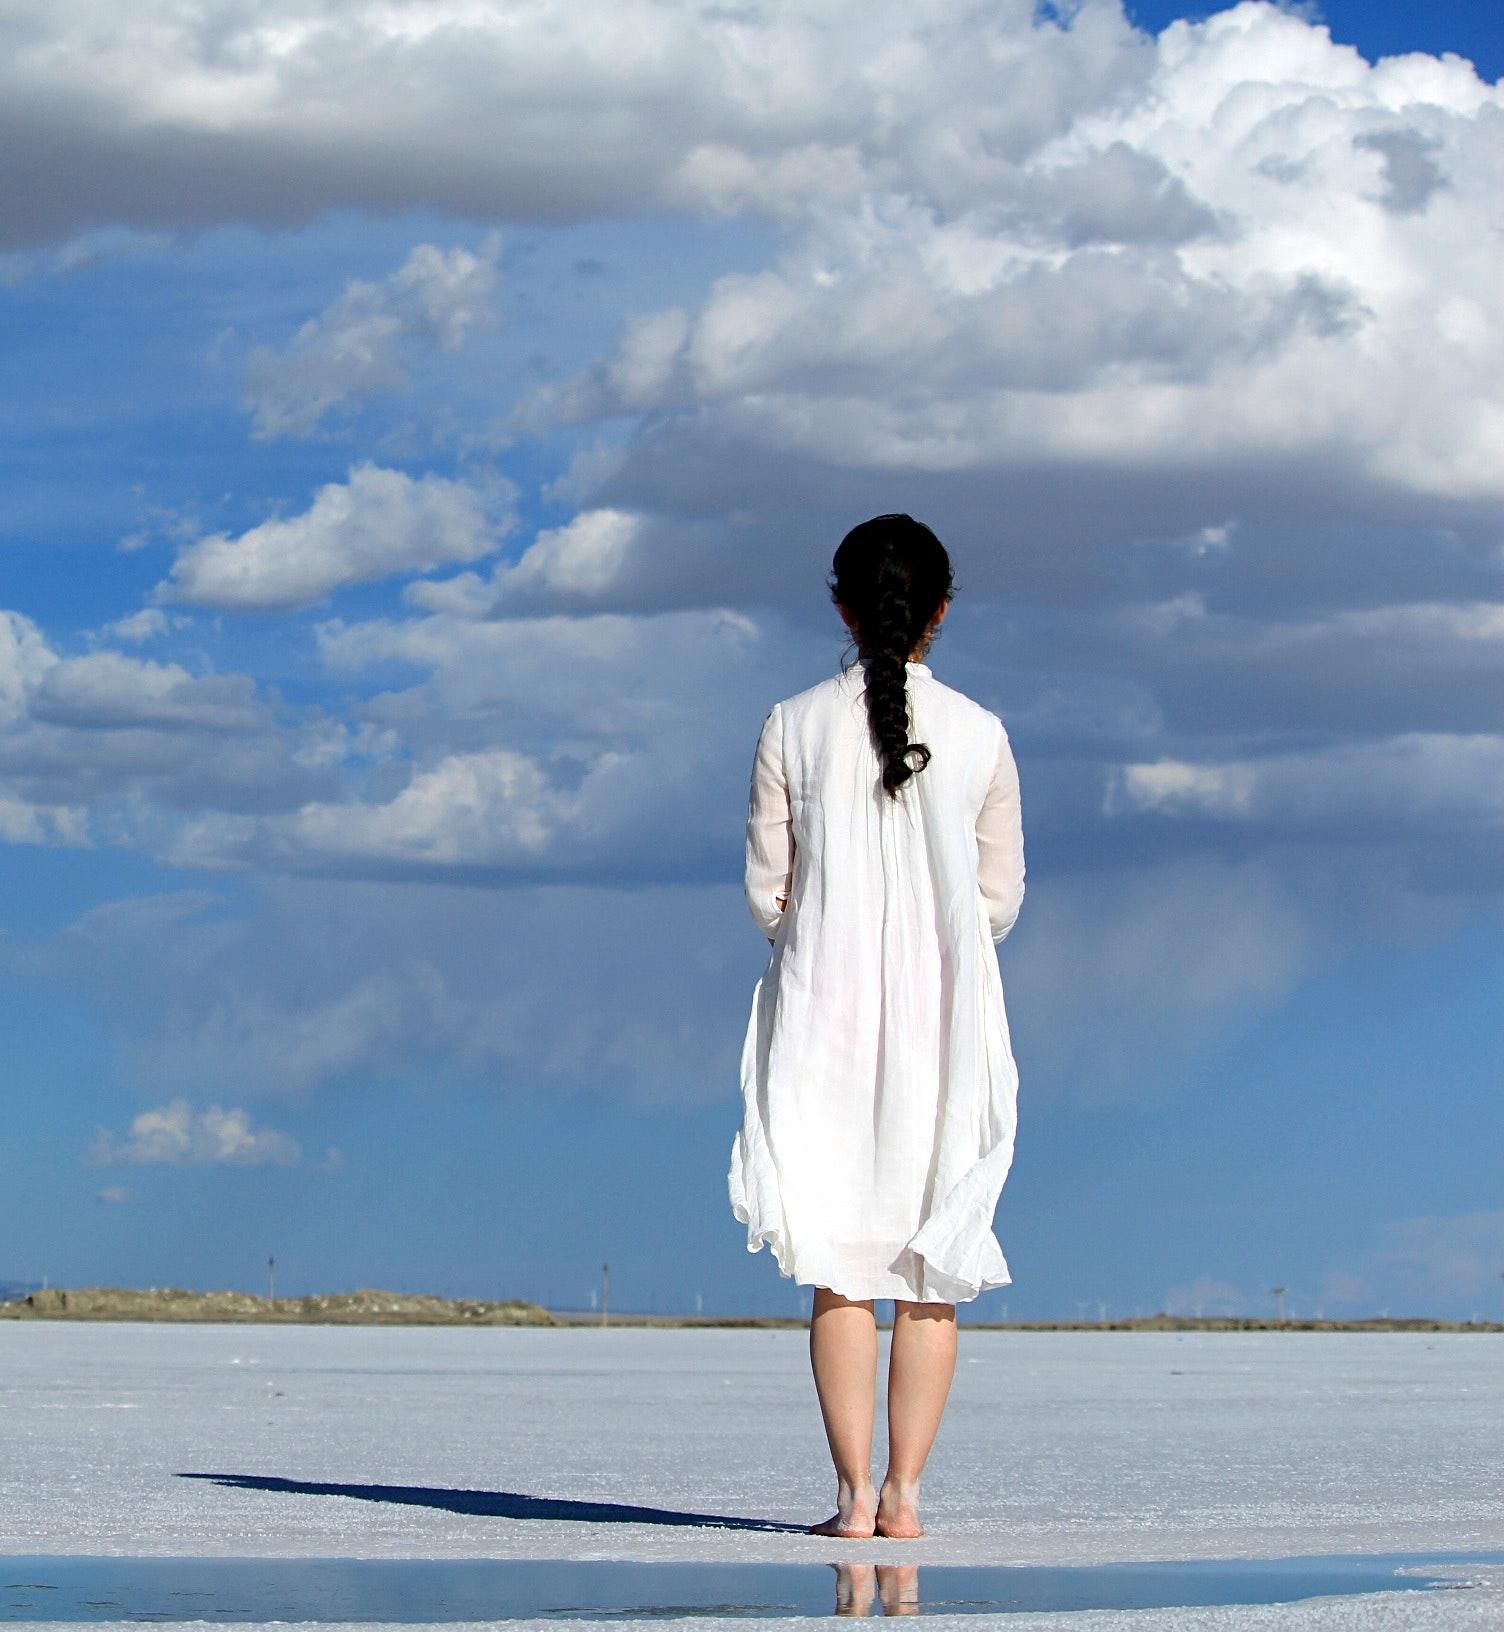 blue-sky-clouds-dress-247304.jpg